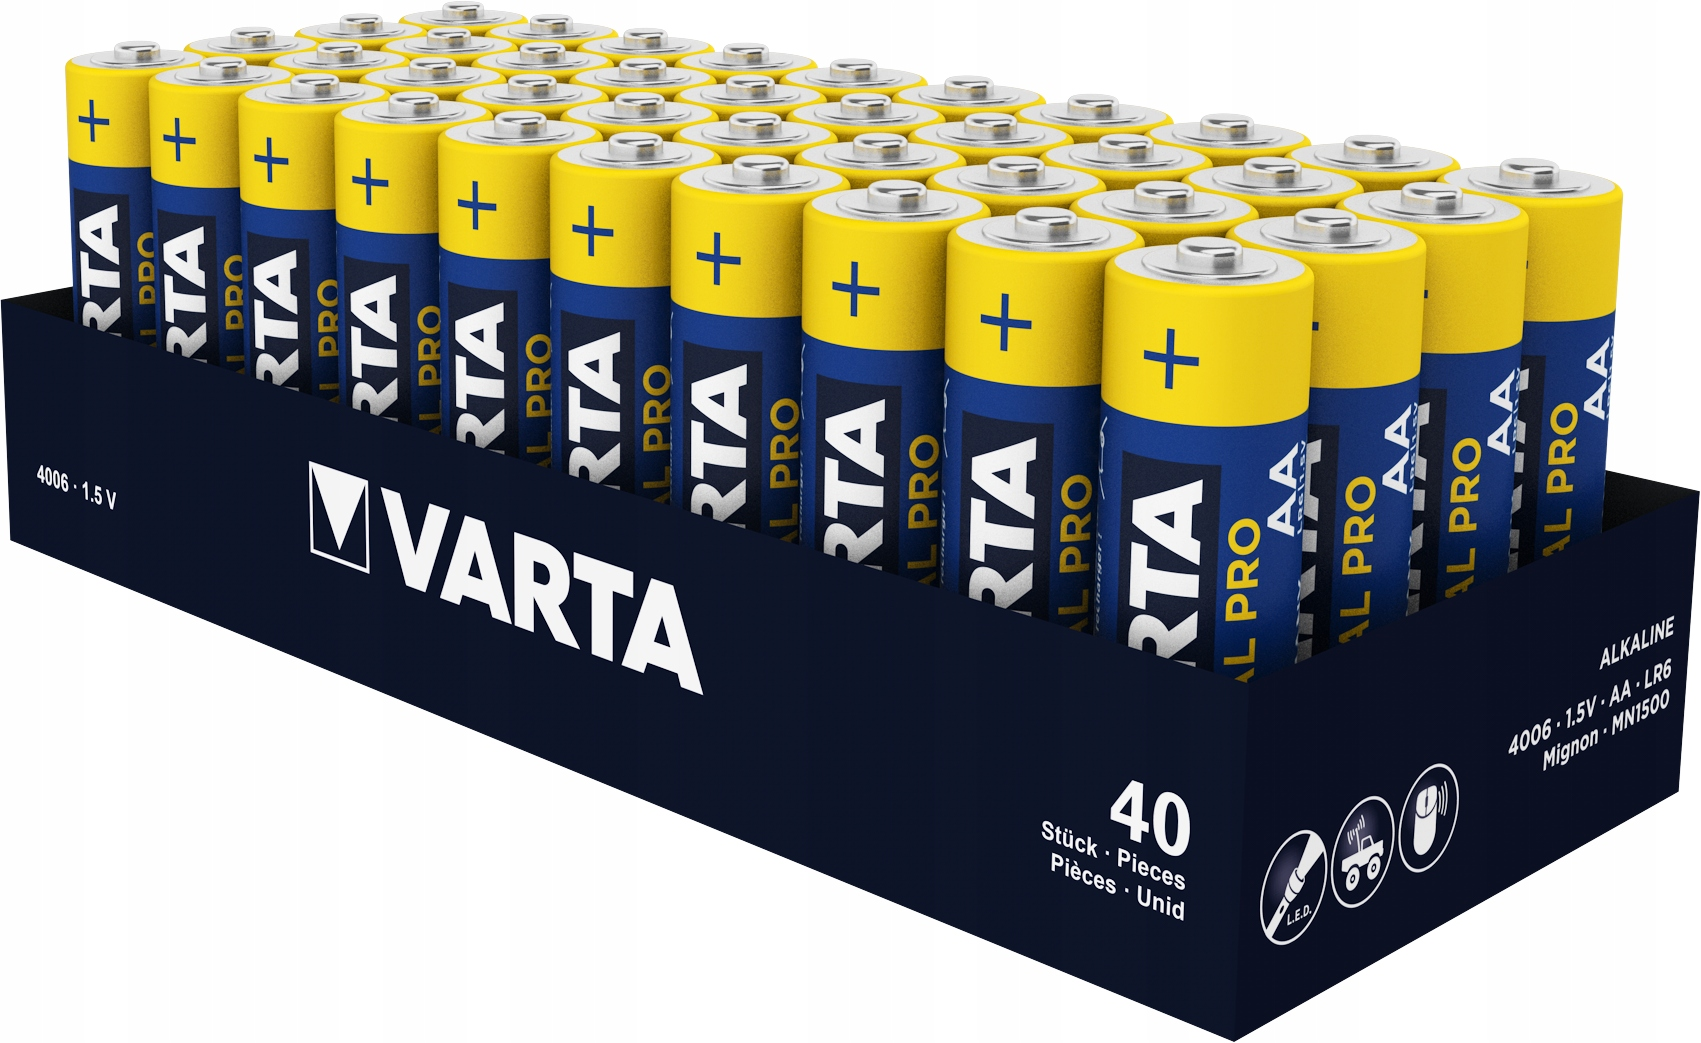 40x BATERIE VARTA INDUSTRIAL LR6 R6 AA